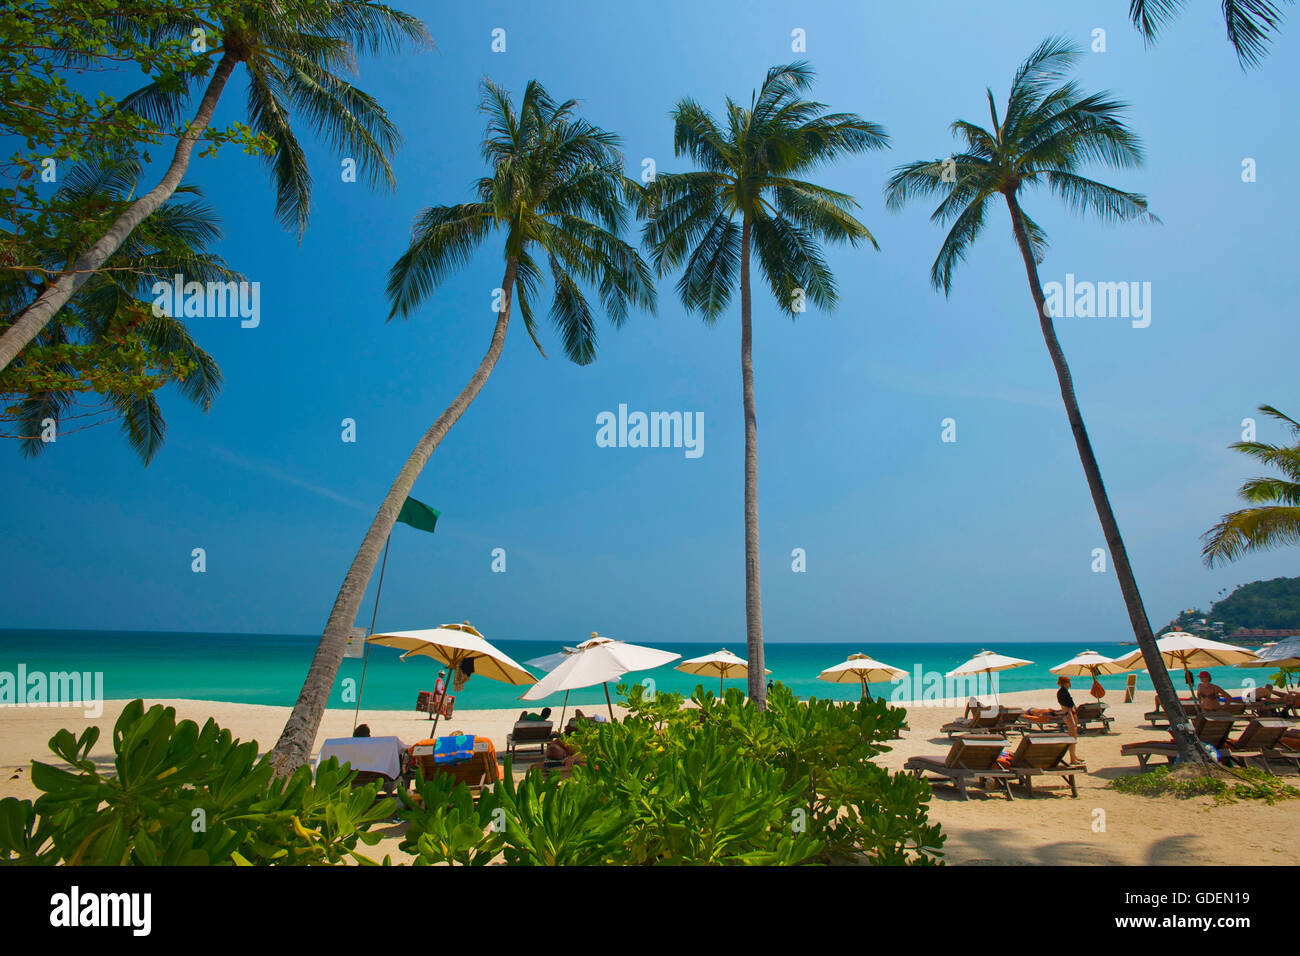 Chaweng Beach, Ko Samui Island, Thailand - Stock Image